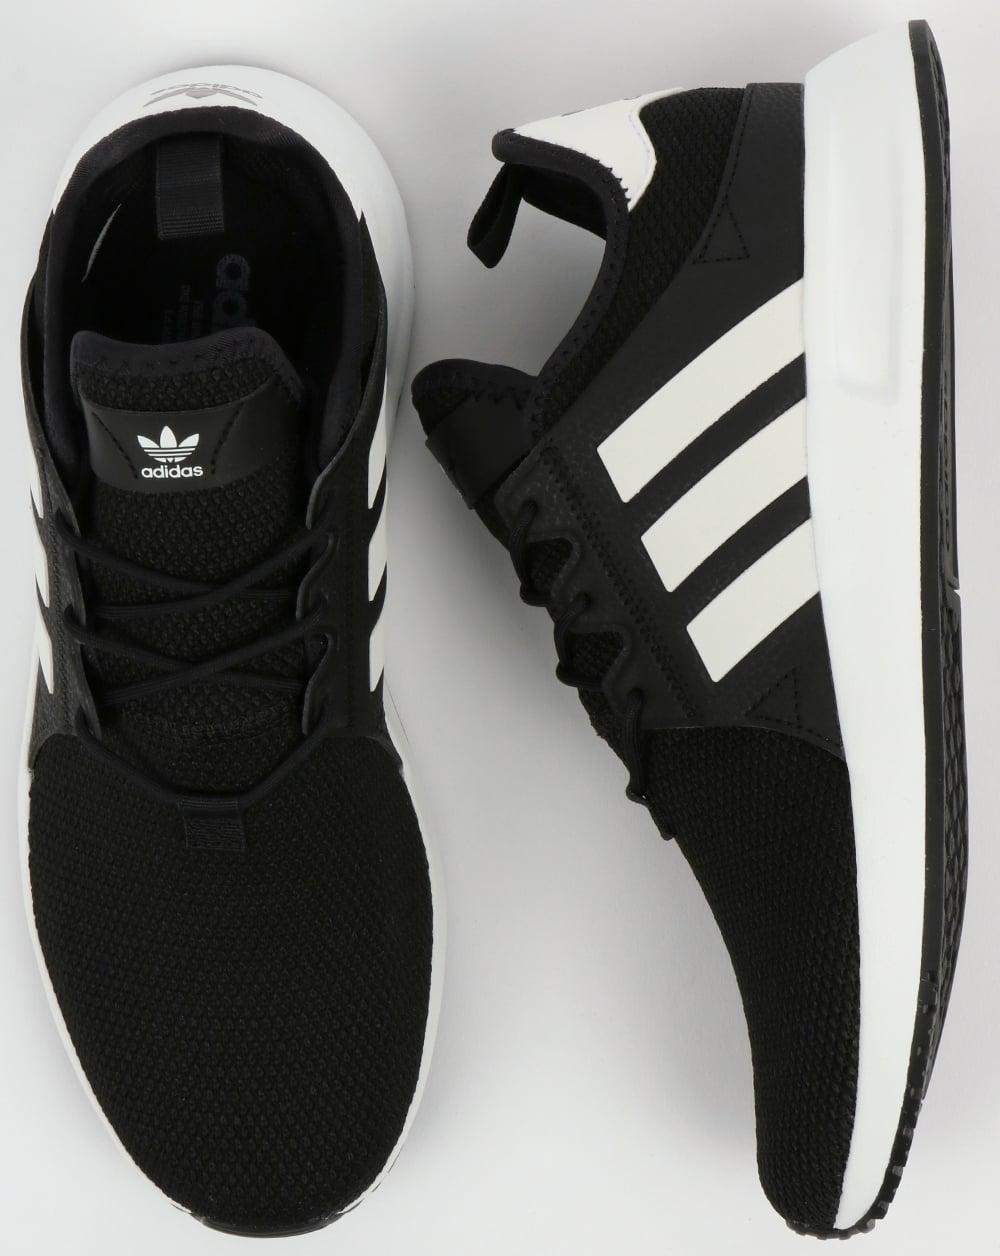 sale retailer 1b780 48fea adidas Trainers Adidas XPLR Trainers BlackWhite